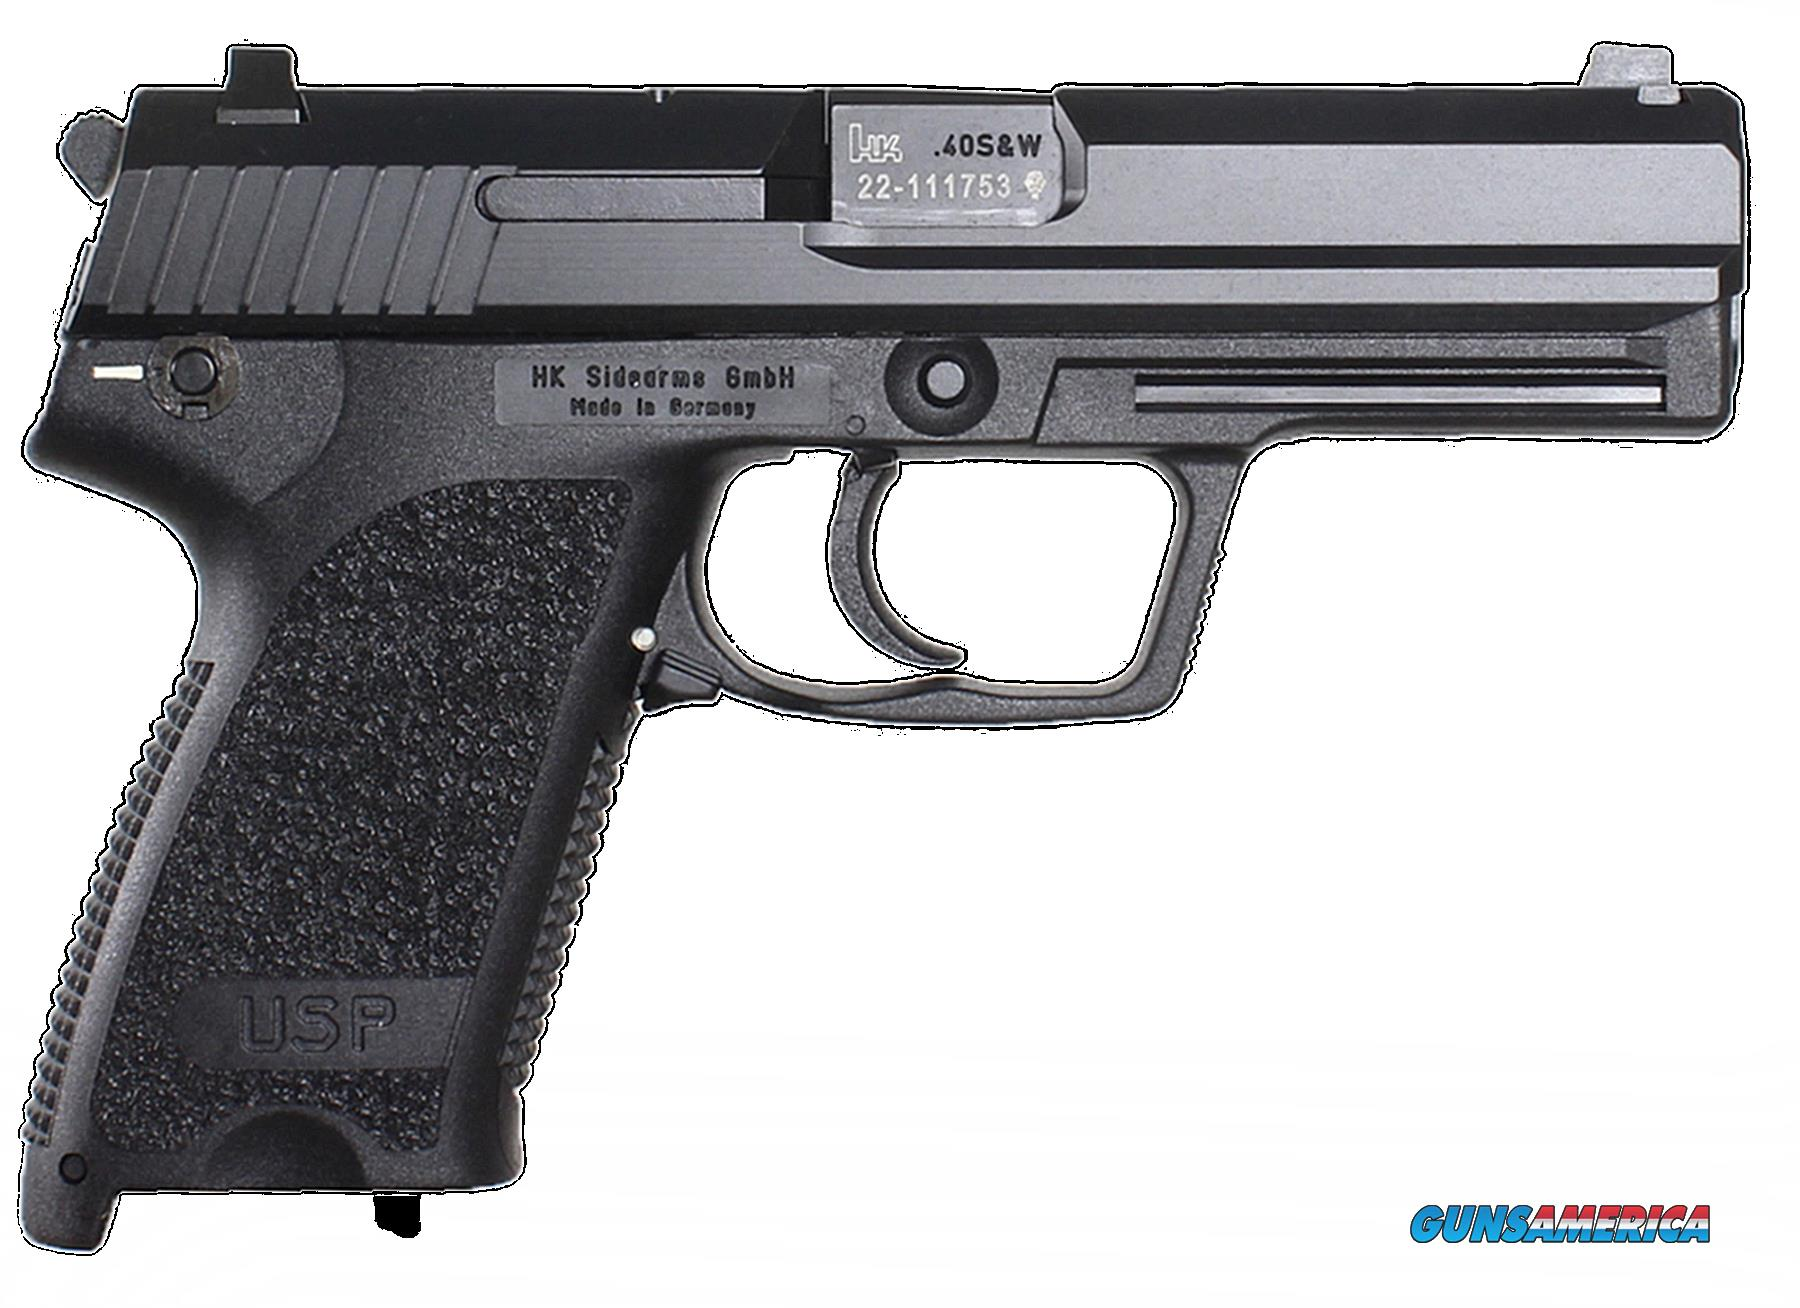 Hk Usp45, Hk 81000322       Usp45 Dasa  45      12r  Guns > Pistols > 1911 Pistol Copies (non-Colt)